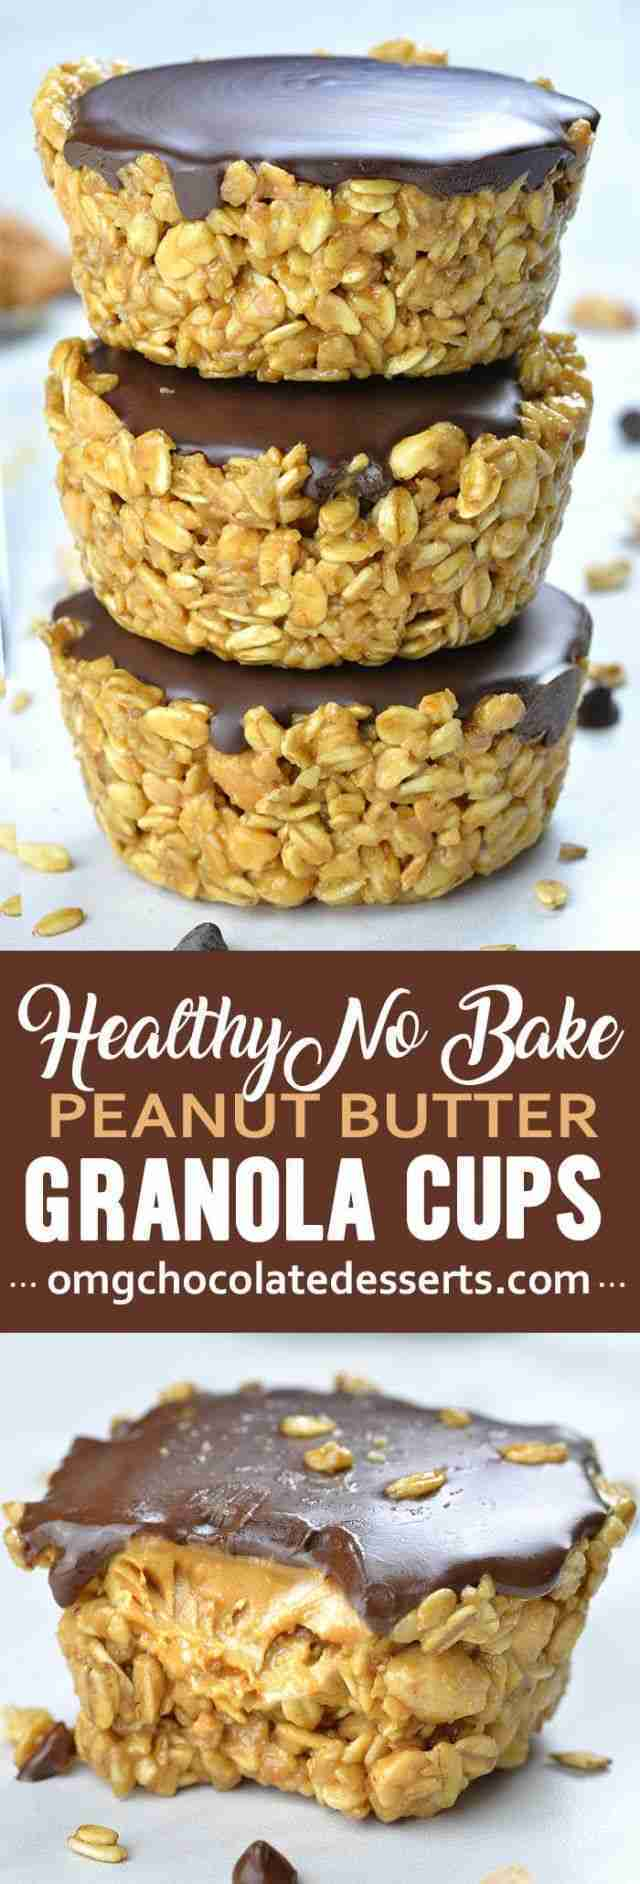 No Bake Peanut Butter Granola Cups, great vegan snack